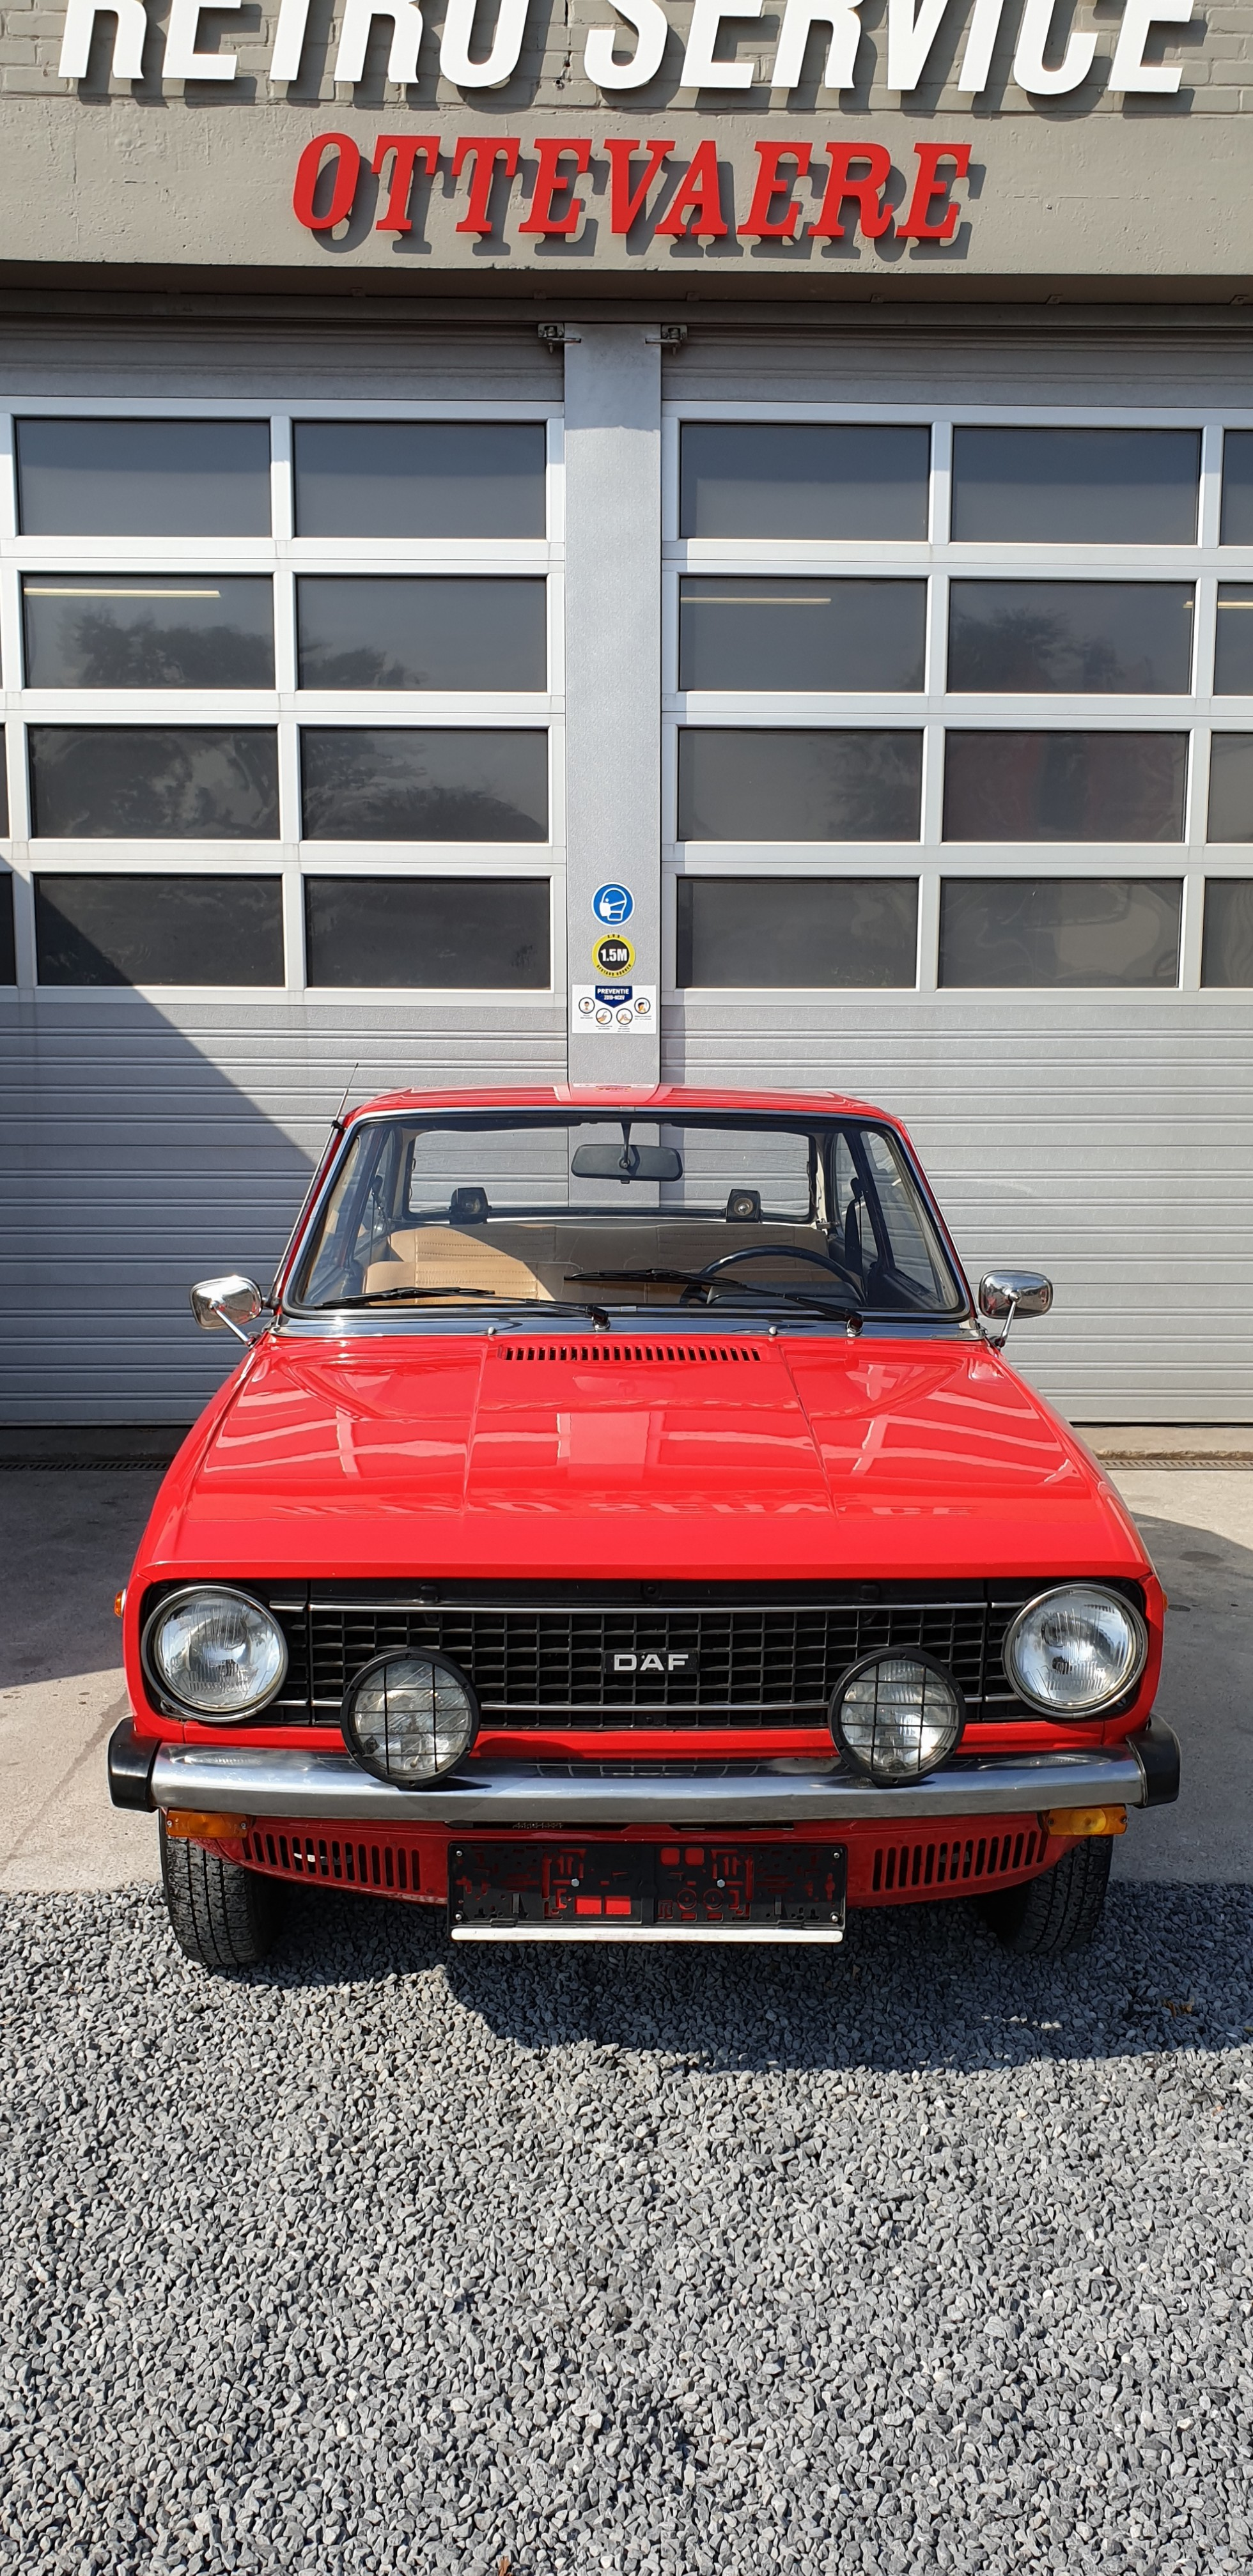 DAF 66 Super Luxe